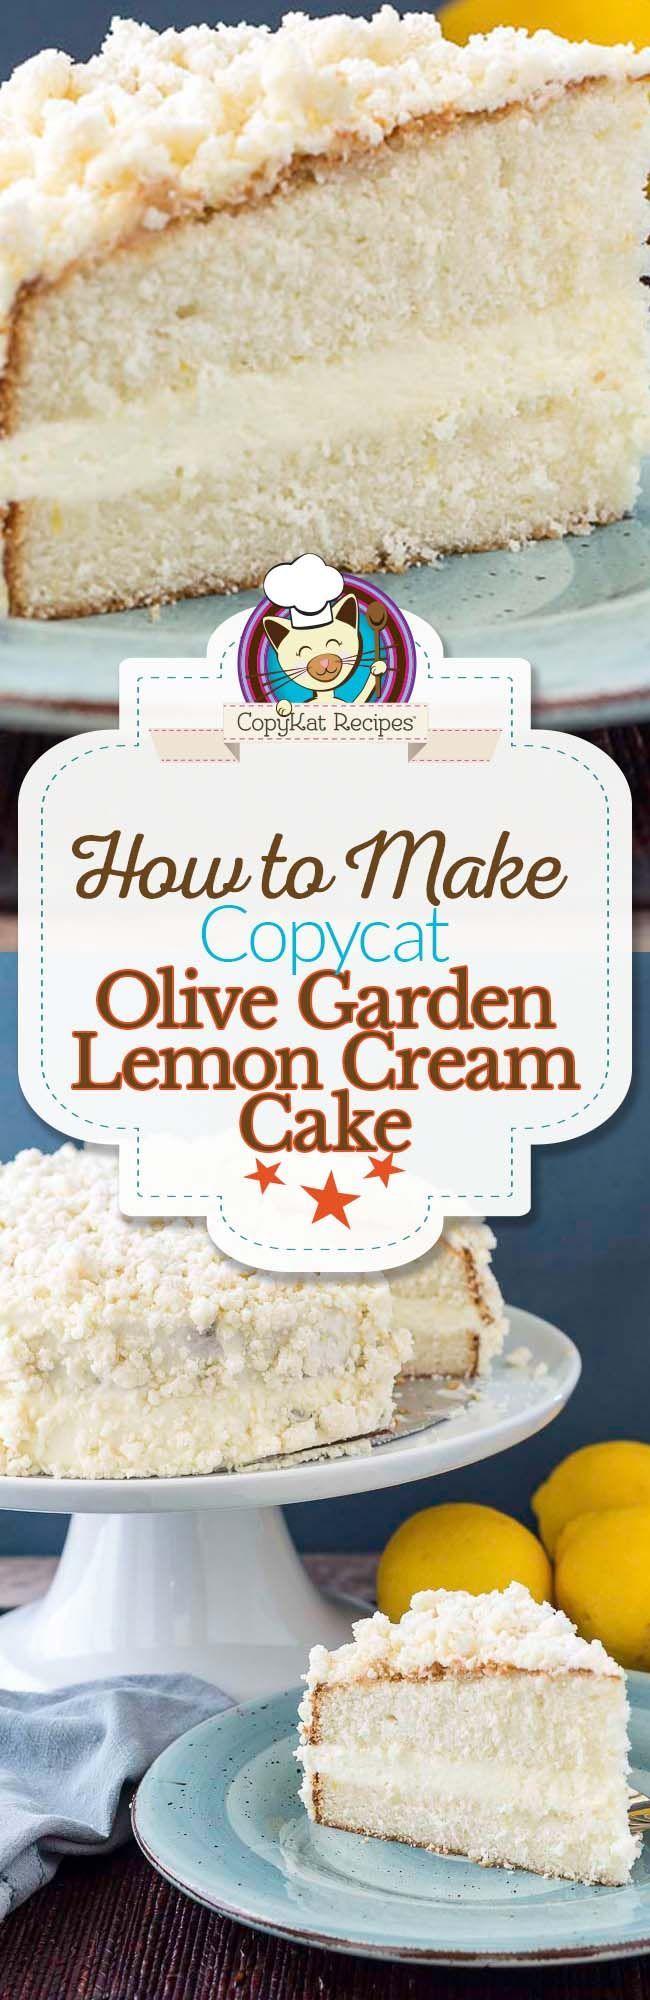 25 best ideas about cream cake on pinterest sour cream - Olive garden lemon cream cake recipe ...